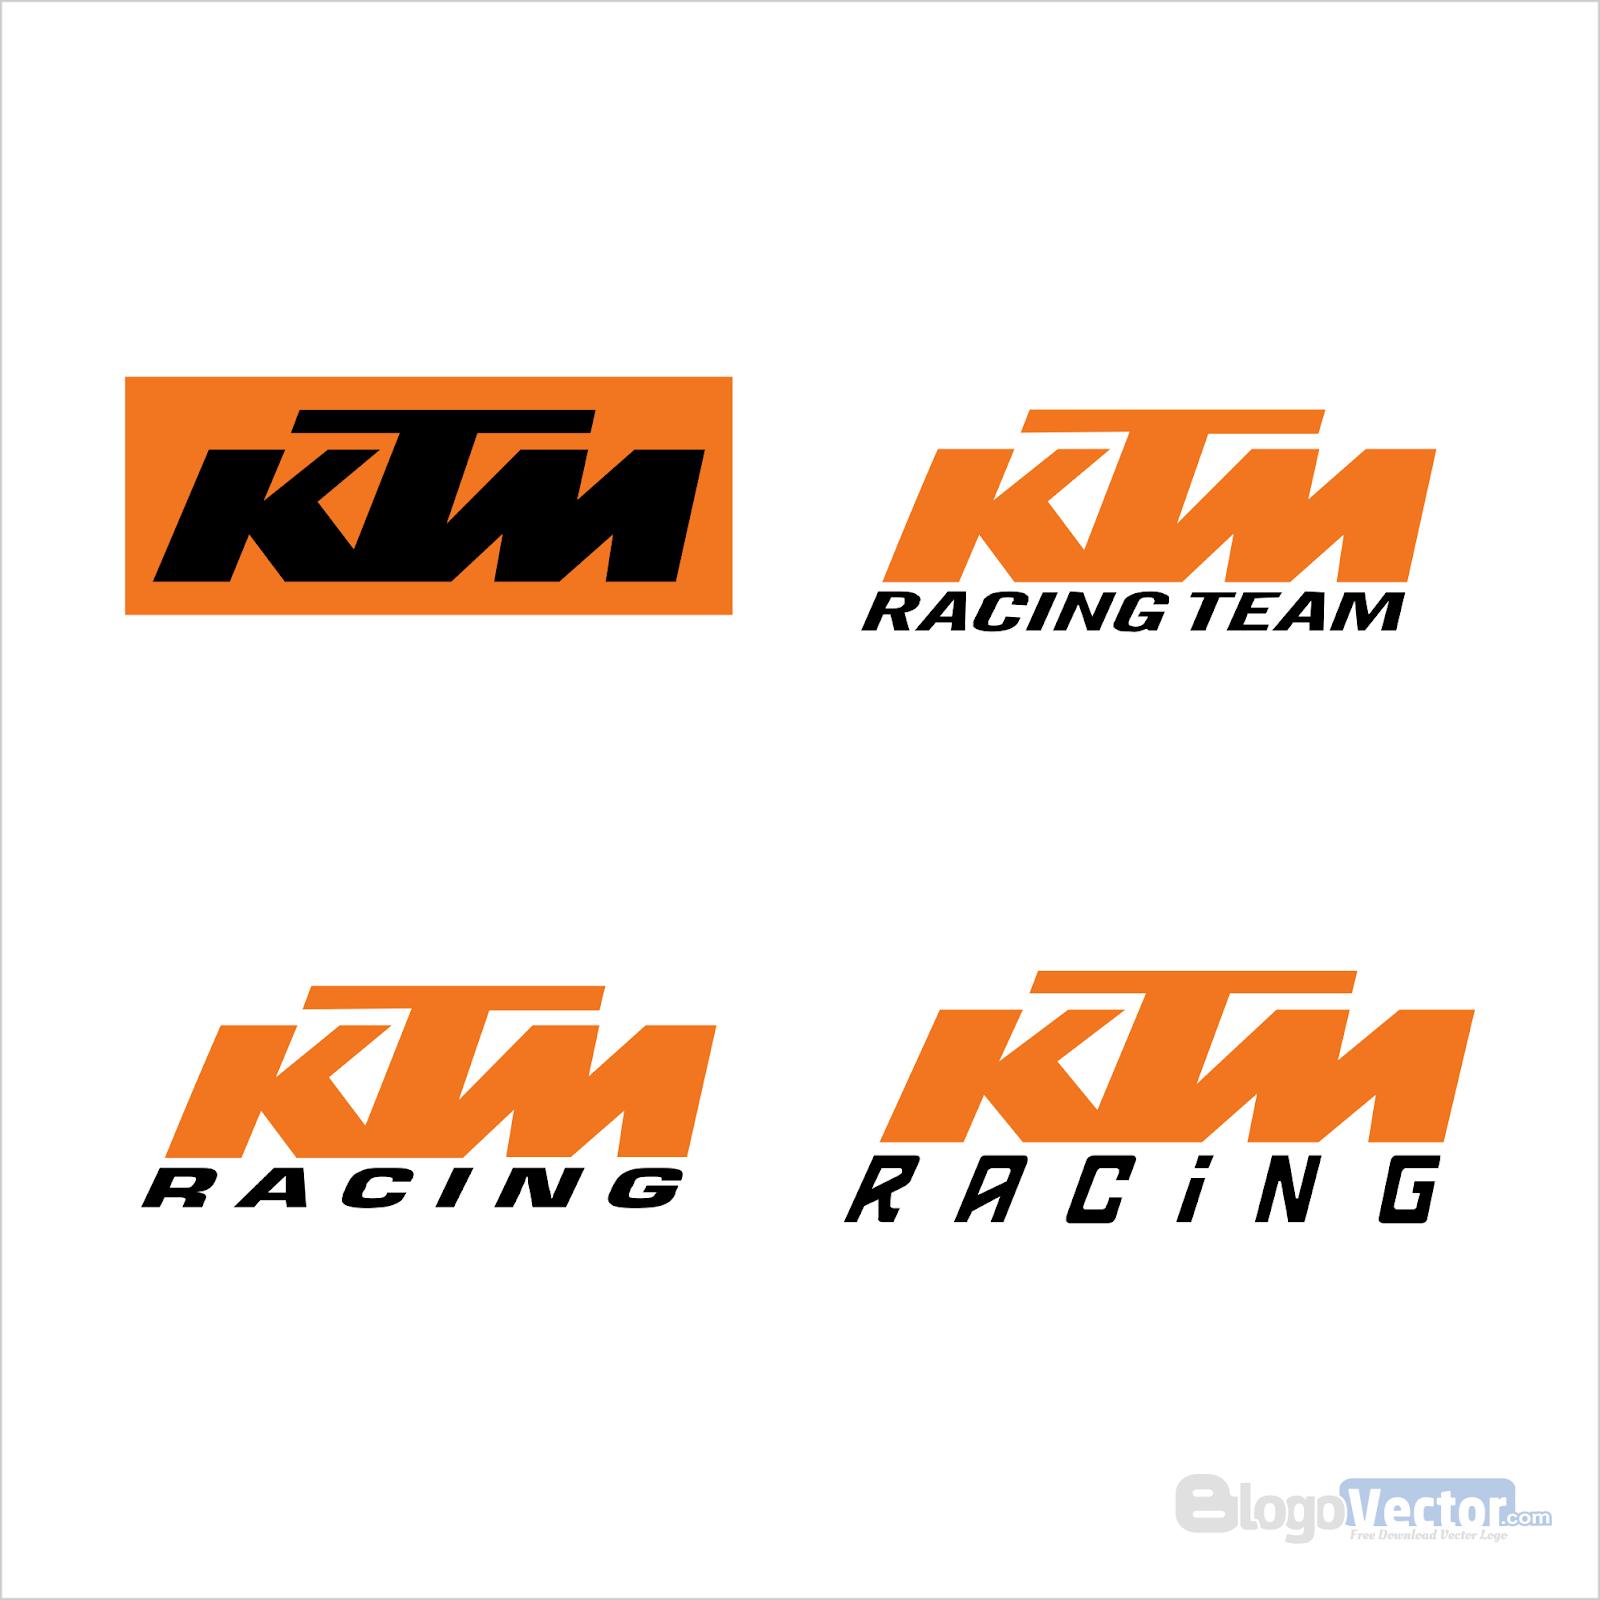 Ktm Racing Logo Vector (.cdr) - Blogovector - Ktm Racing Logo PNG